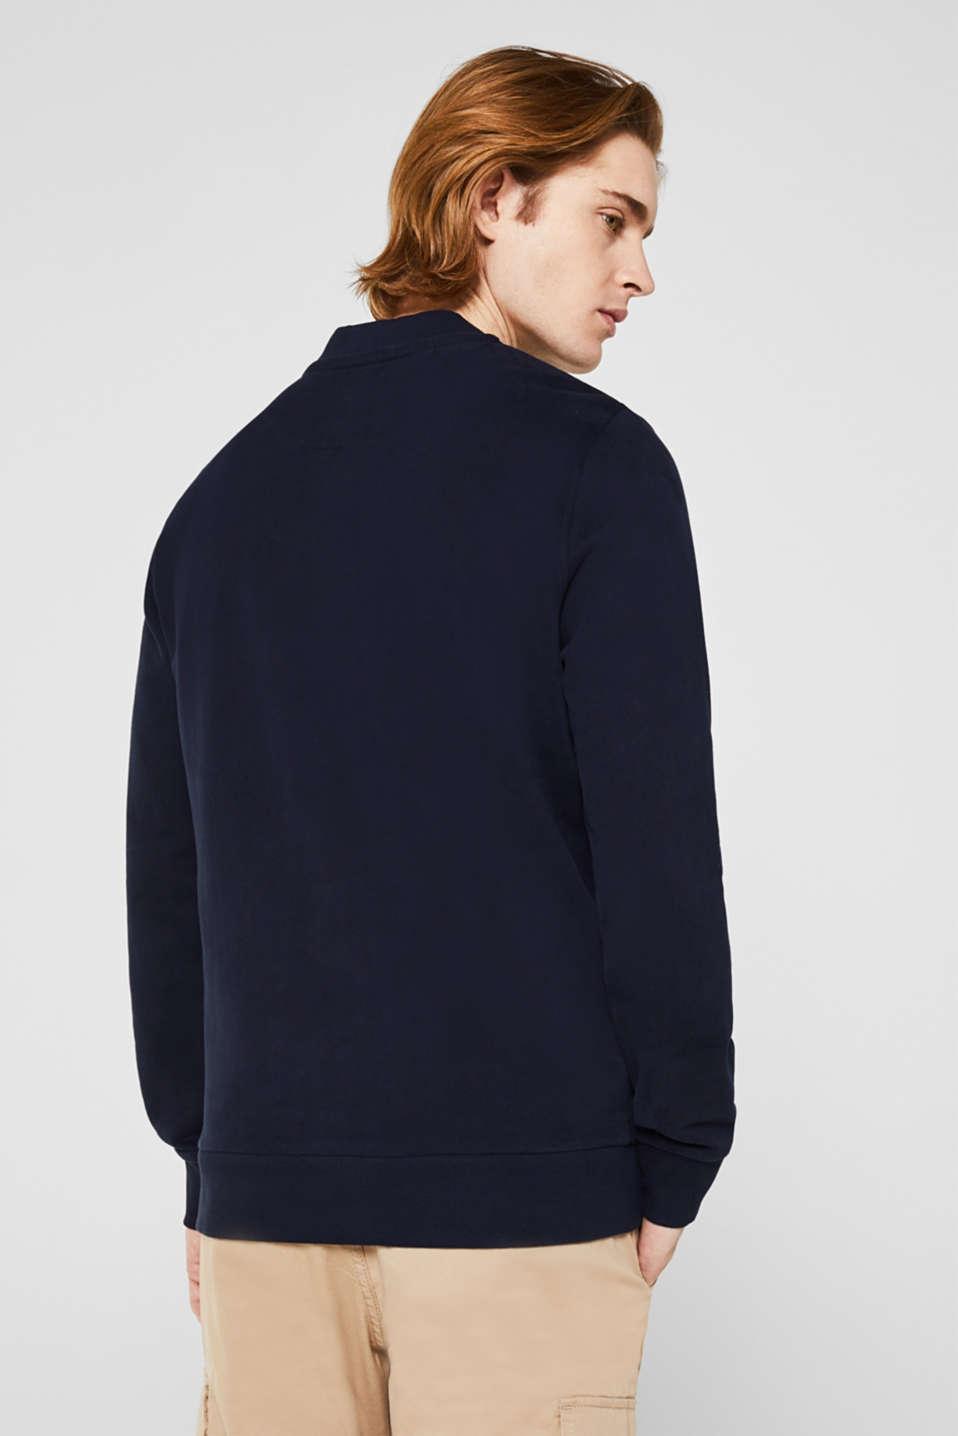 Bomber-style sweatshirt jacket, 100% cotton, NAVY, detail image number 3